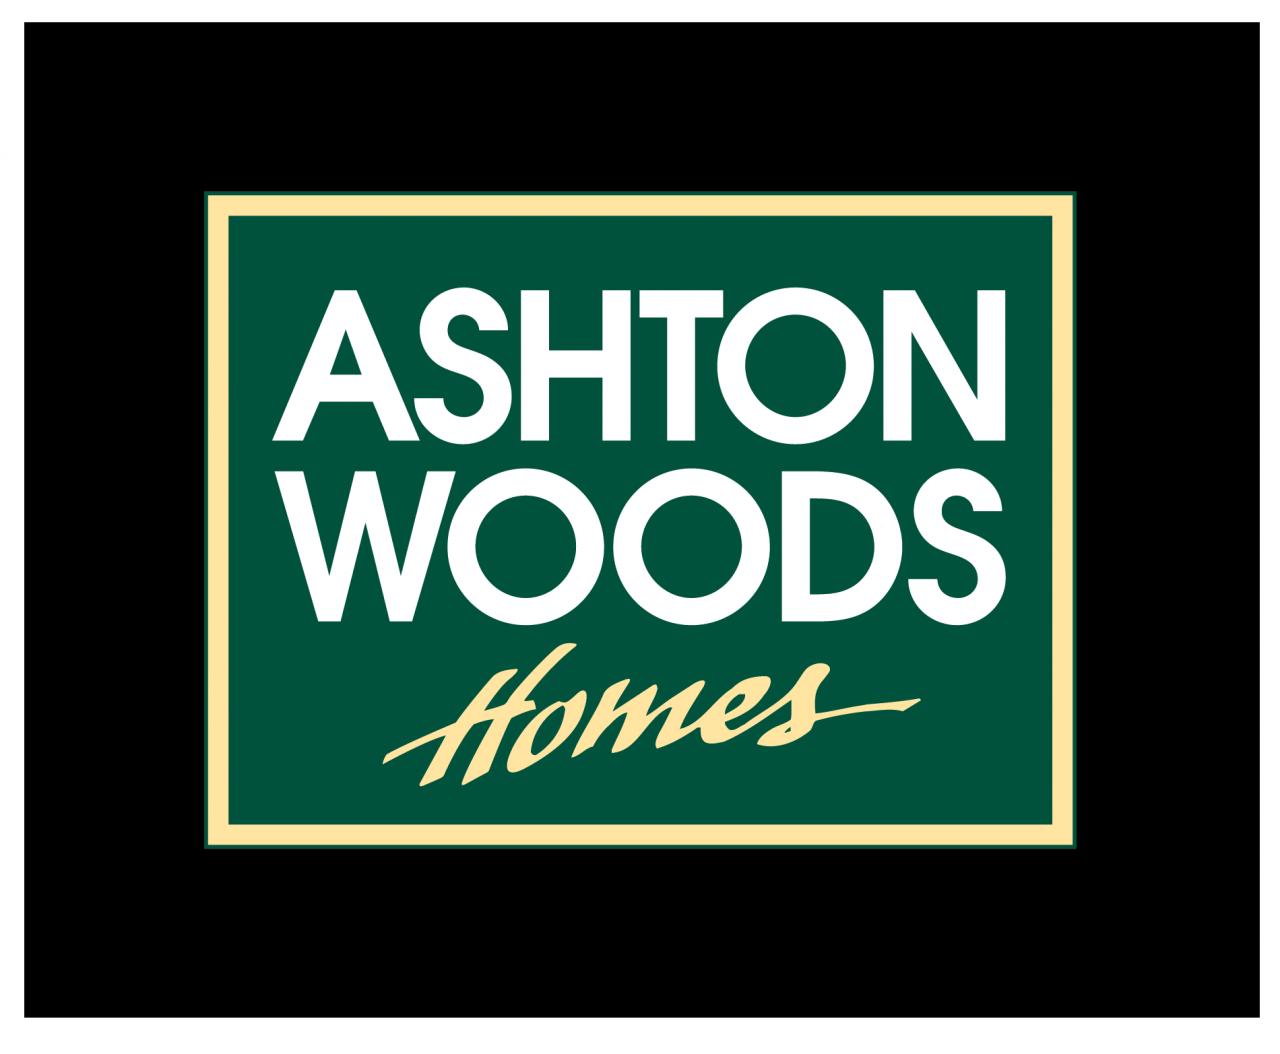 ashton-woods